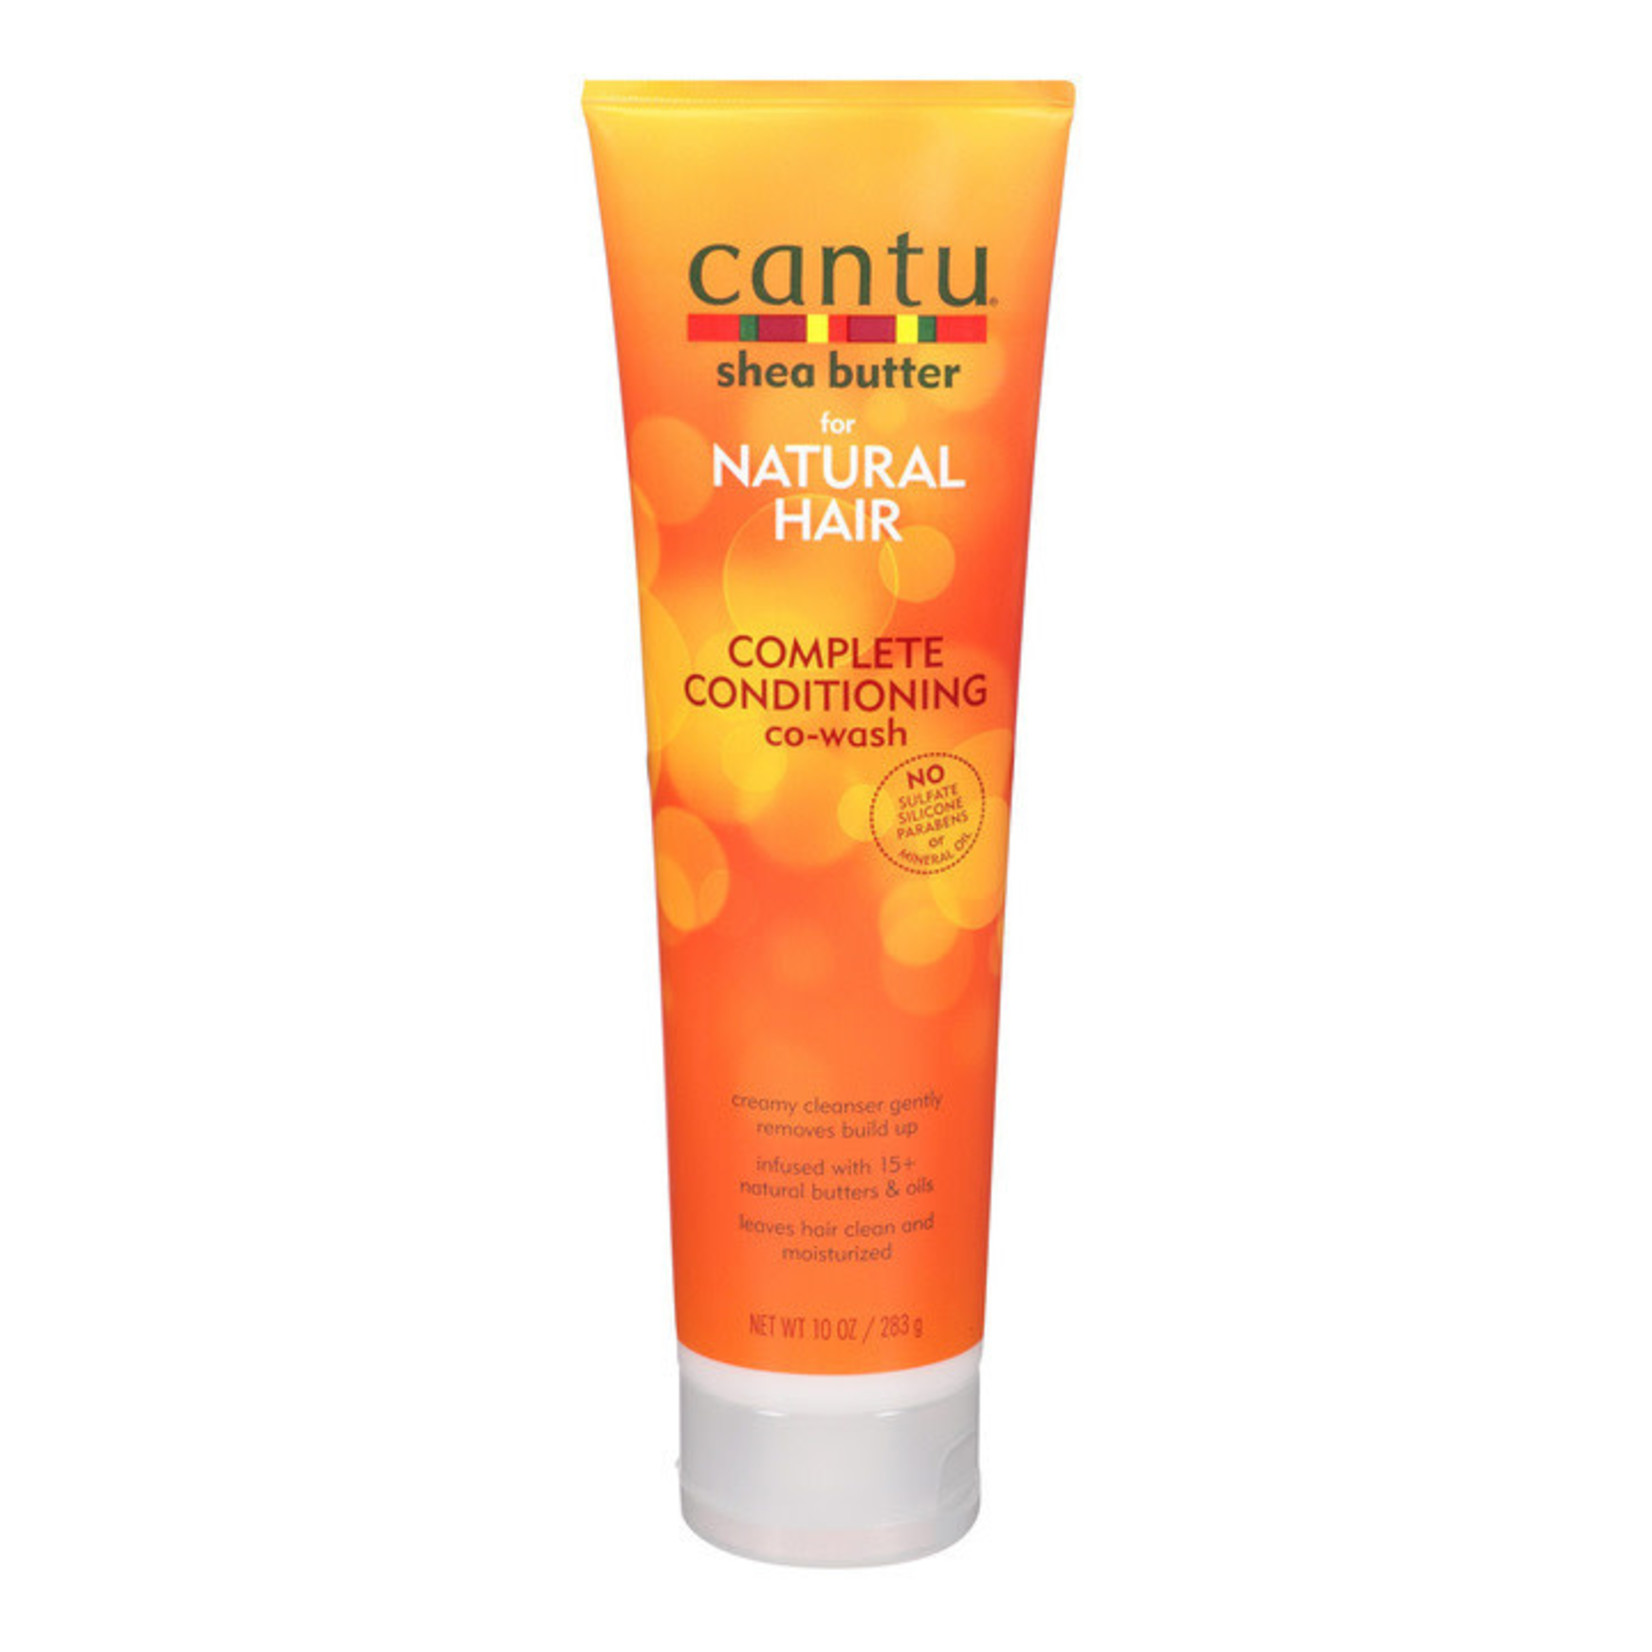 CANTU CANTU NATURAL HAIR CONDITIONING CO-WASH [10OZ]